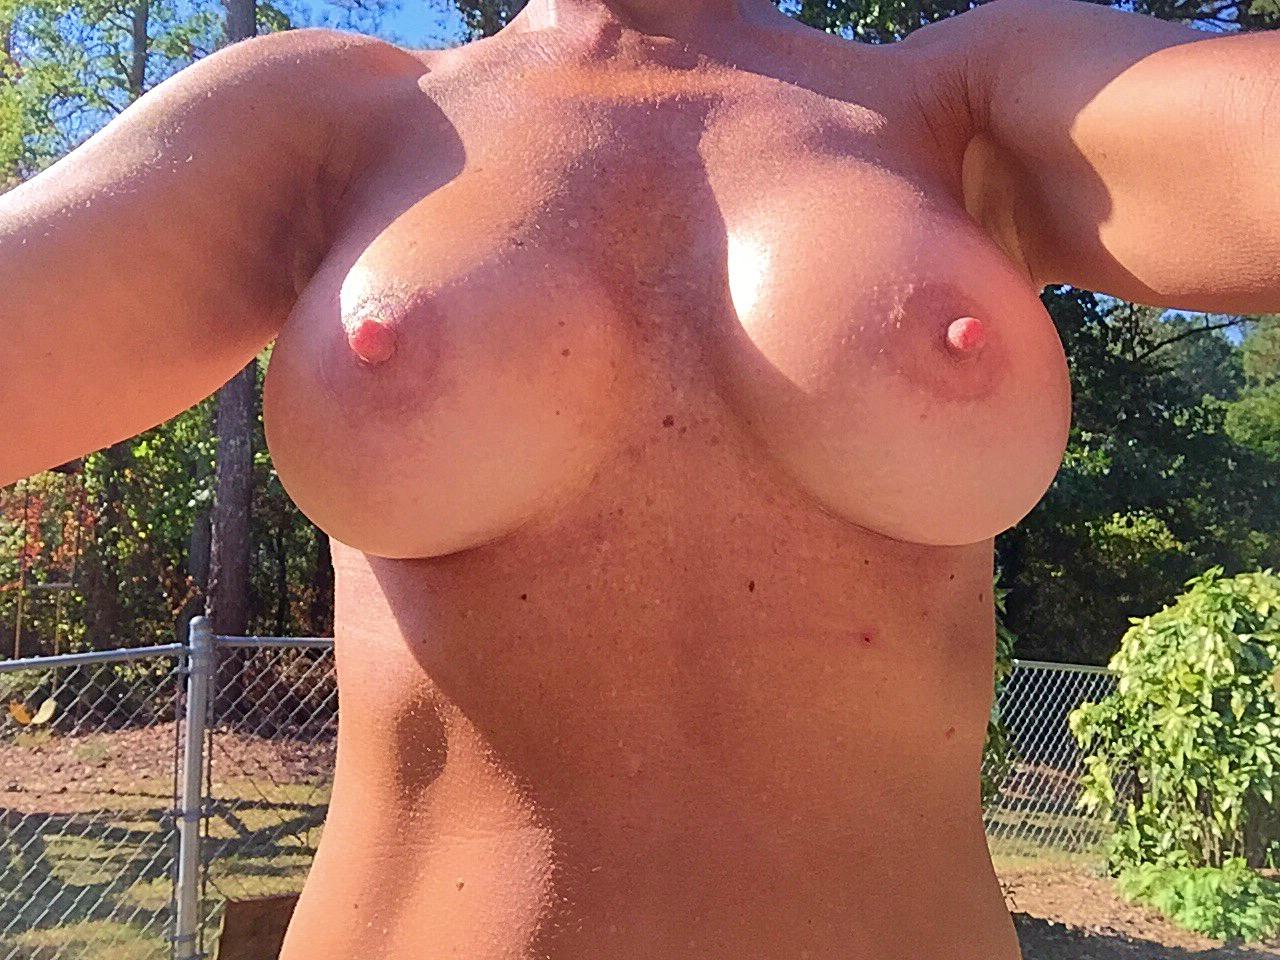 floppy tits galore